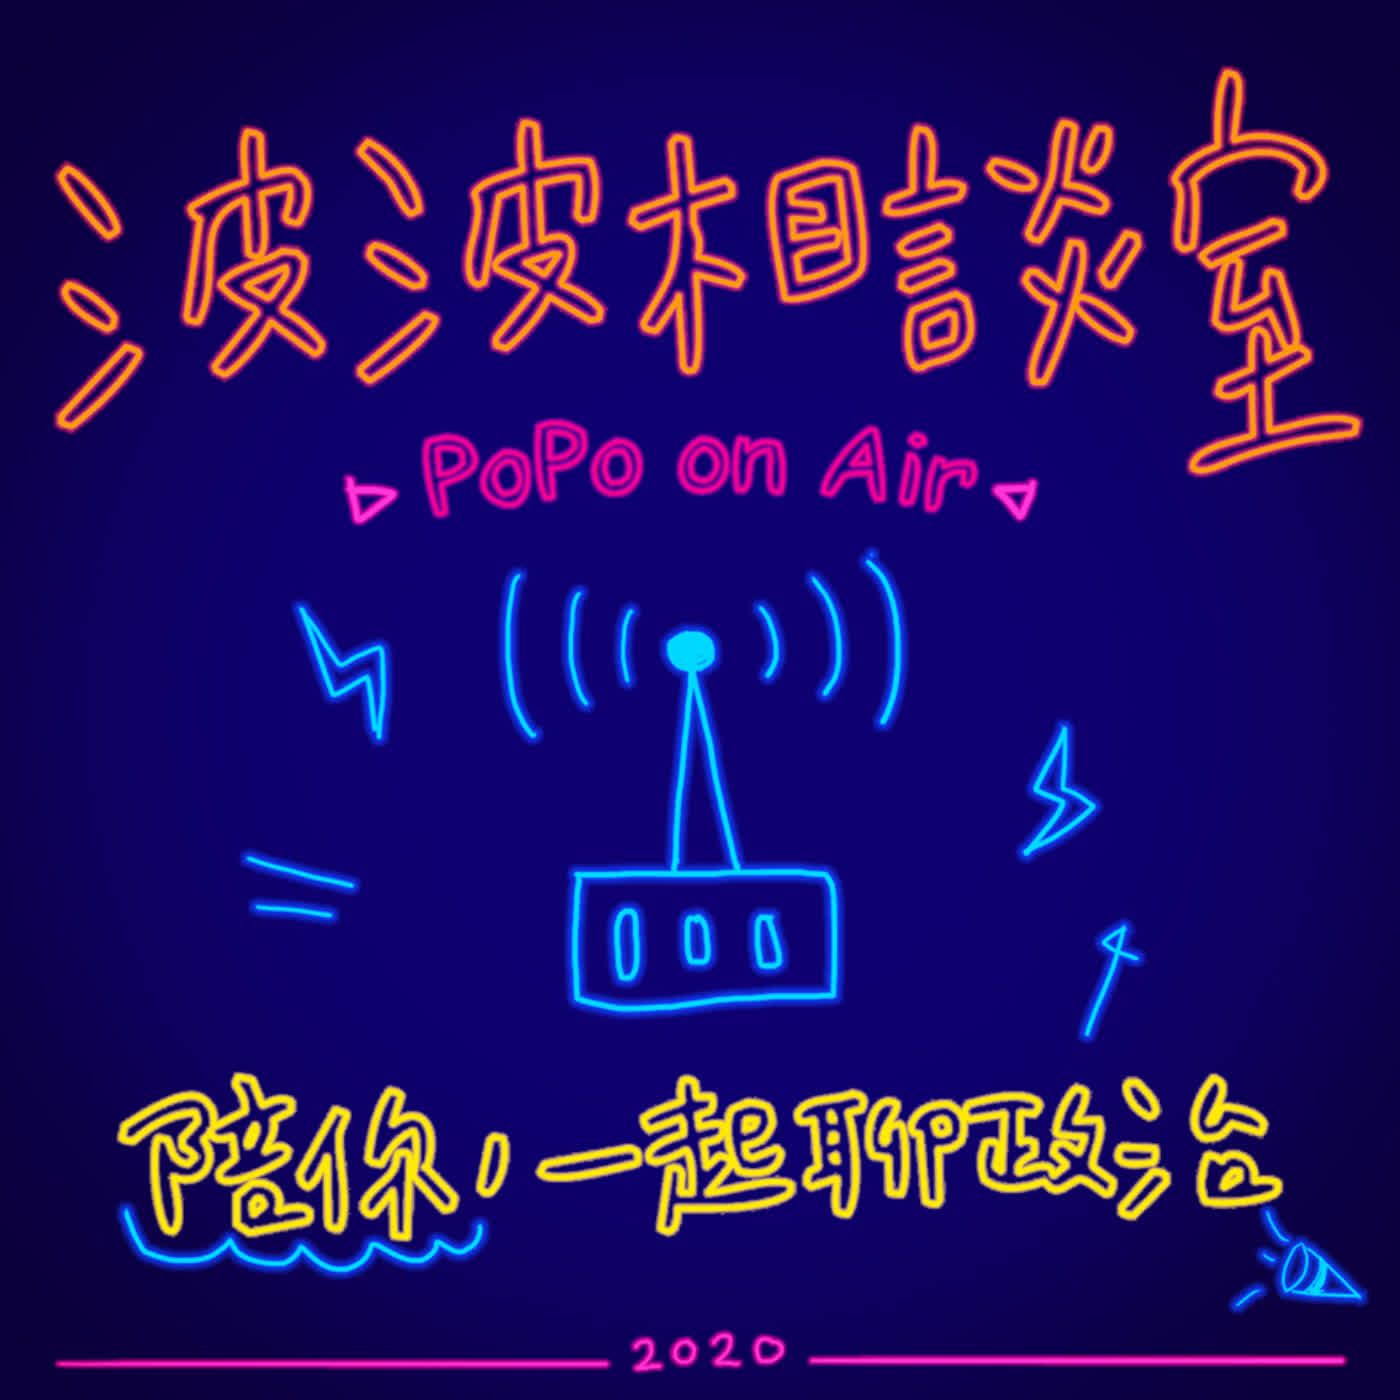 EP4 罷韓後聊聊-全民民主課,溝通不能只有「粉」